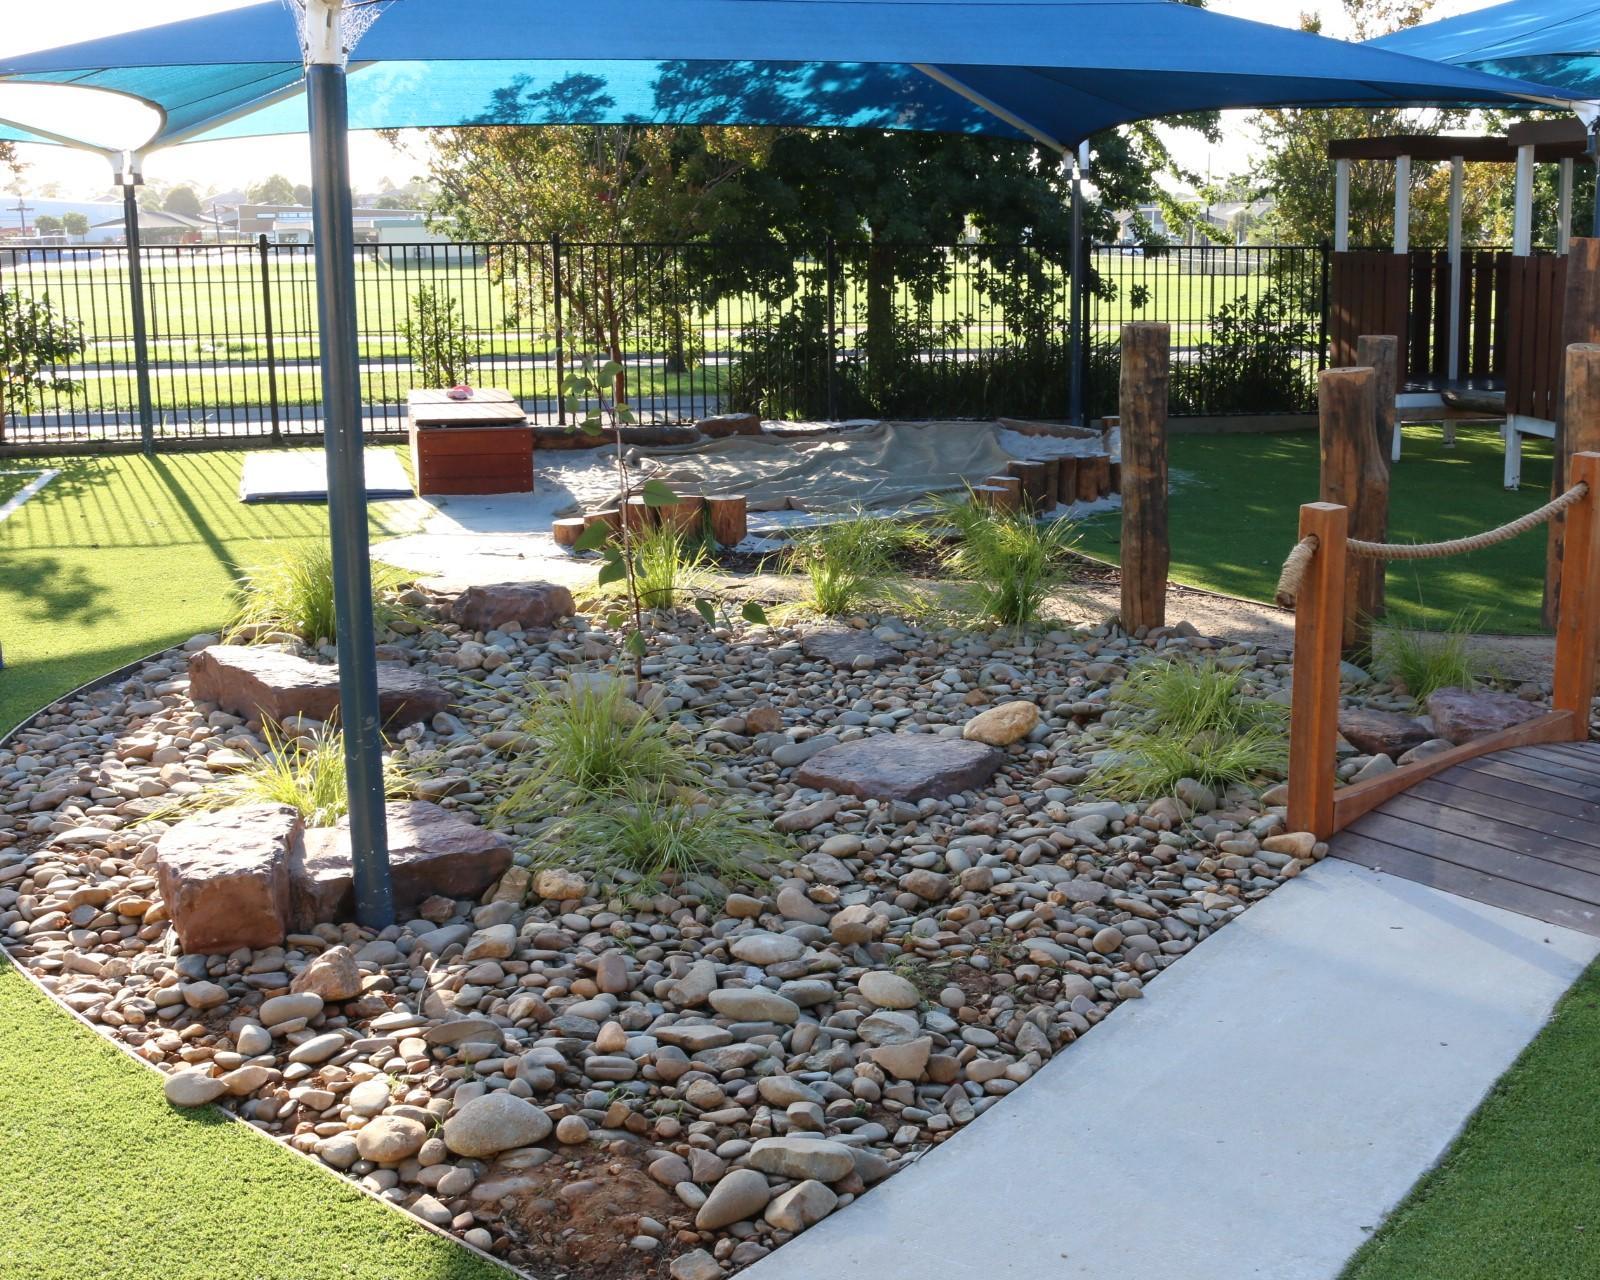 childcare centre Cranbourne - dry creek bed drainage